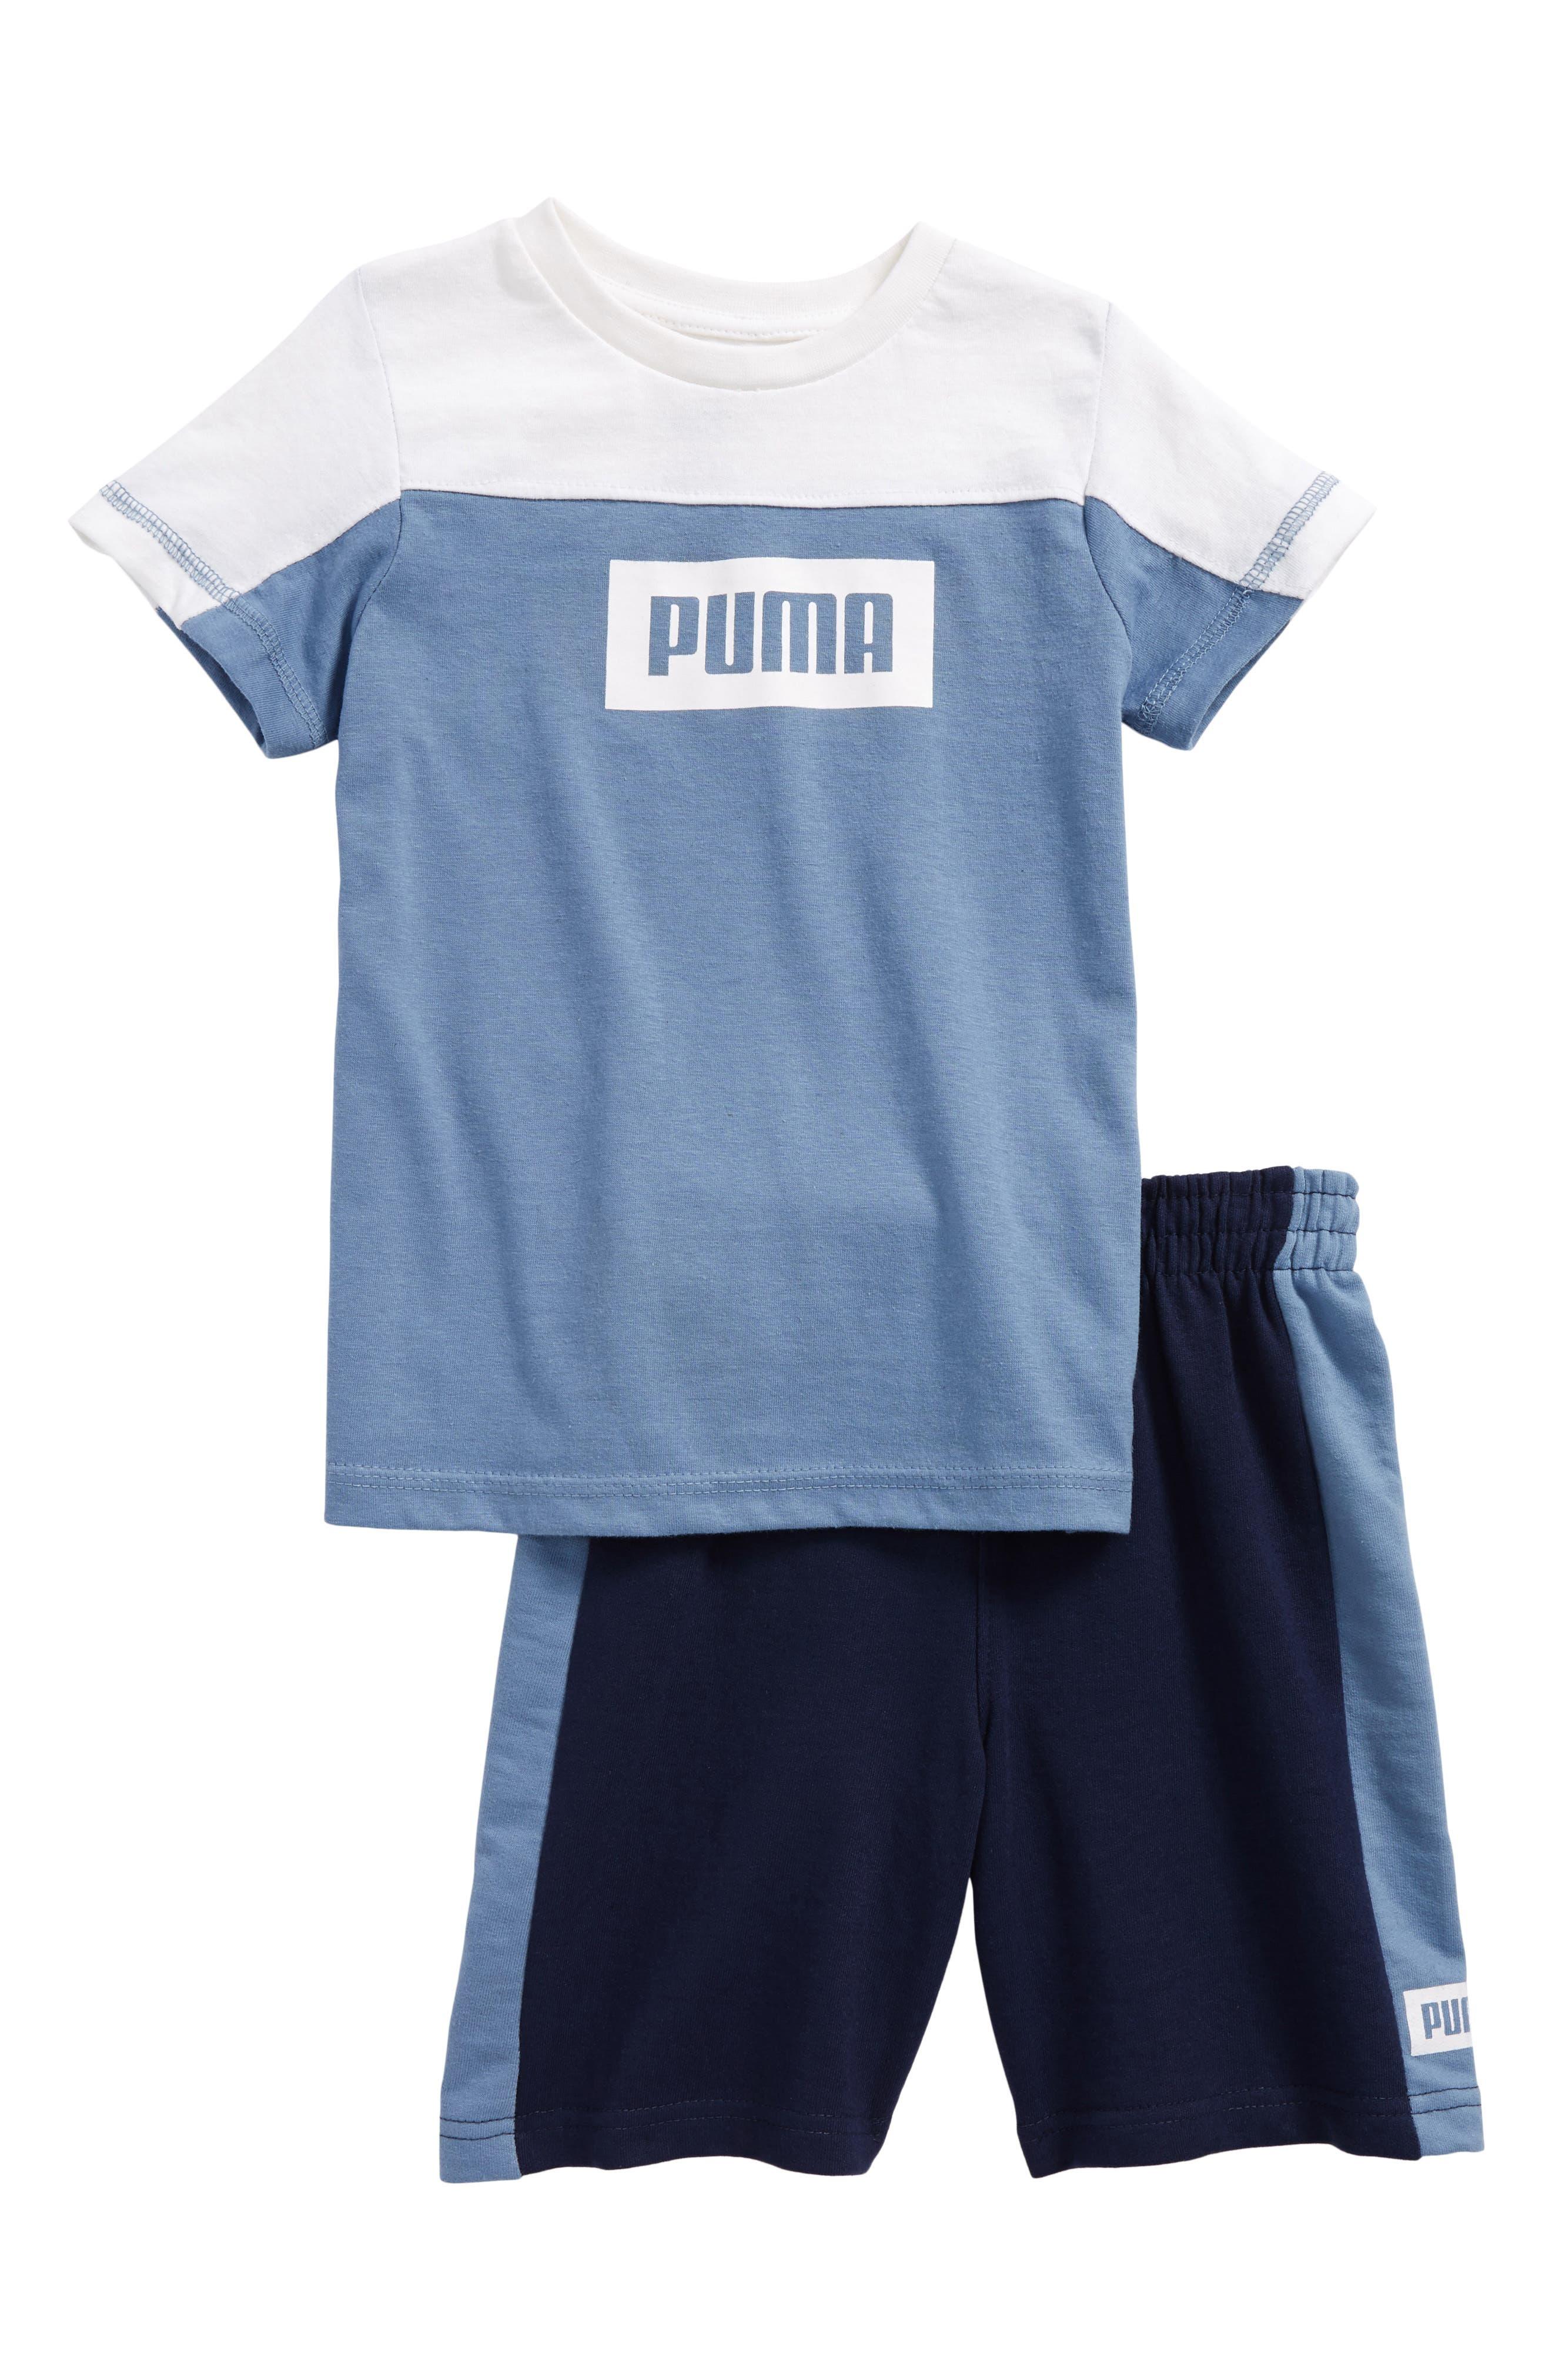 Main Image - PUMA Rebel Logo T-Shirt & Shorts Set (Toddler Boys & Little Boys)